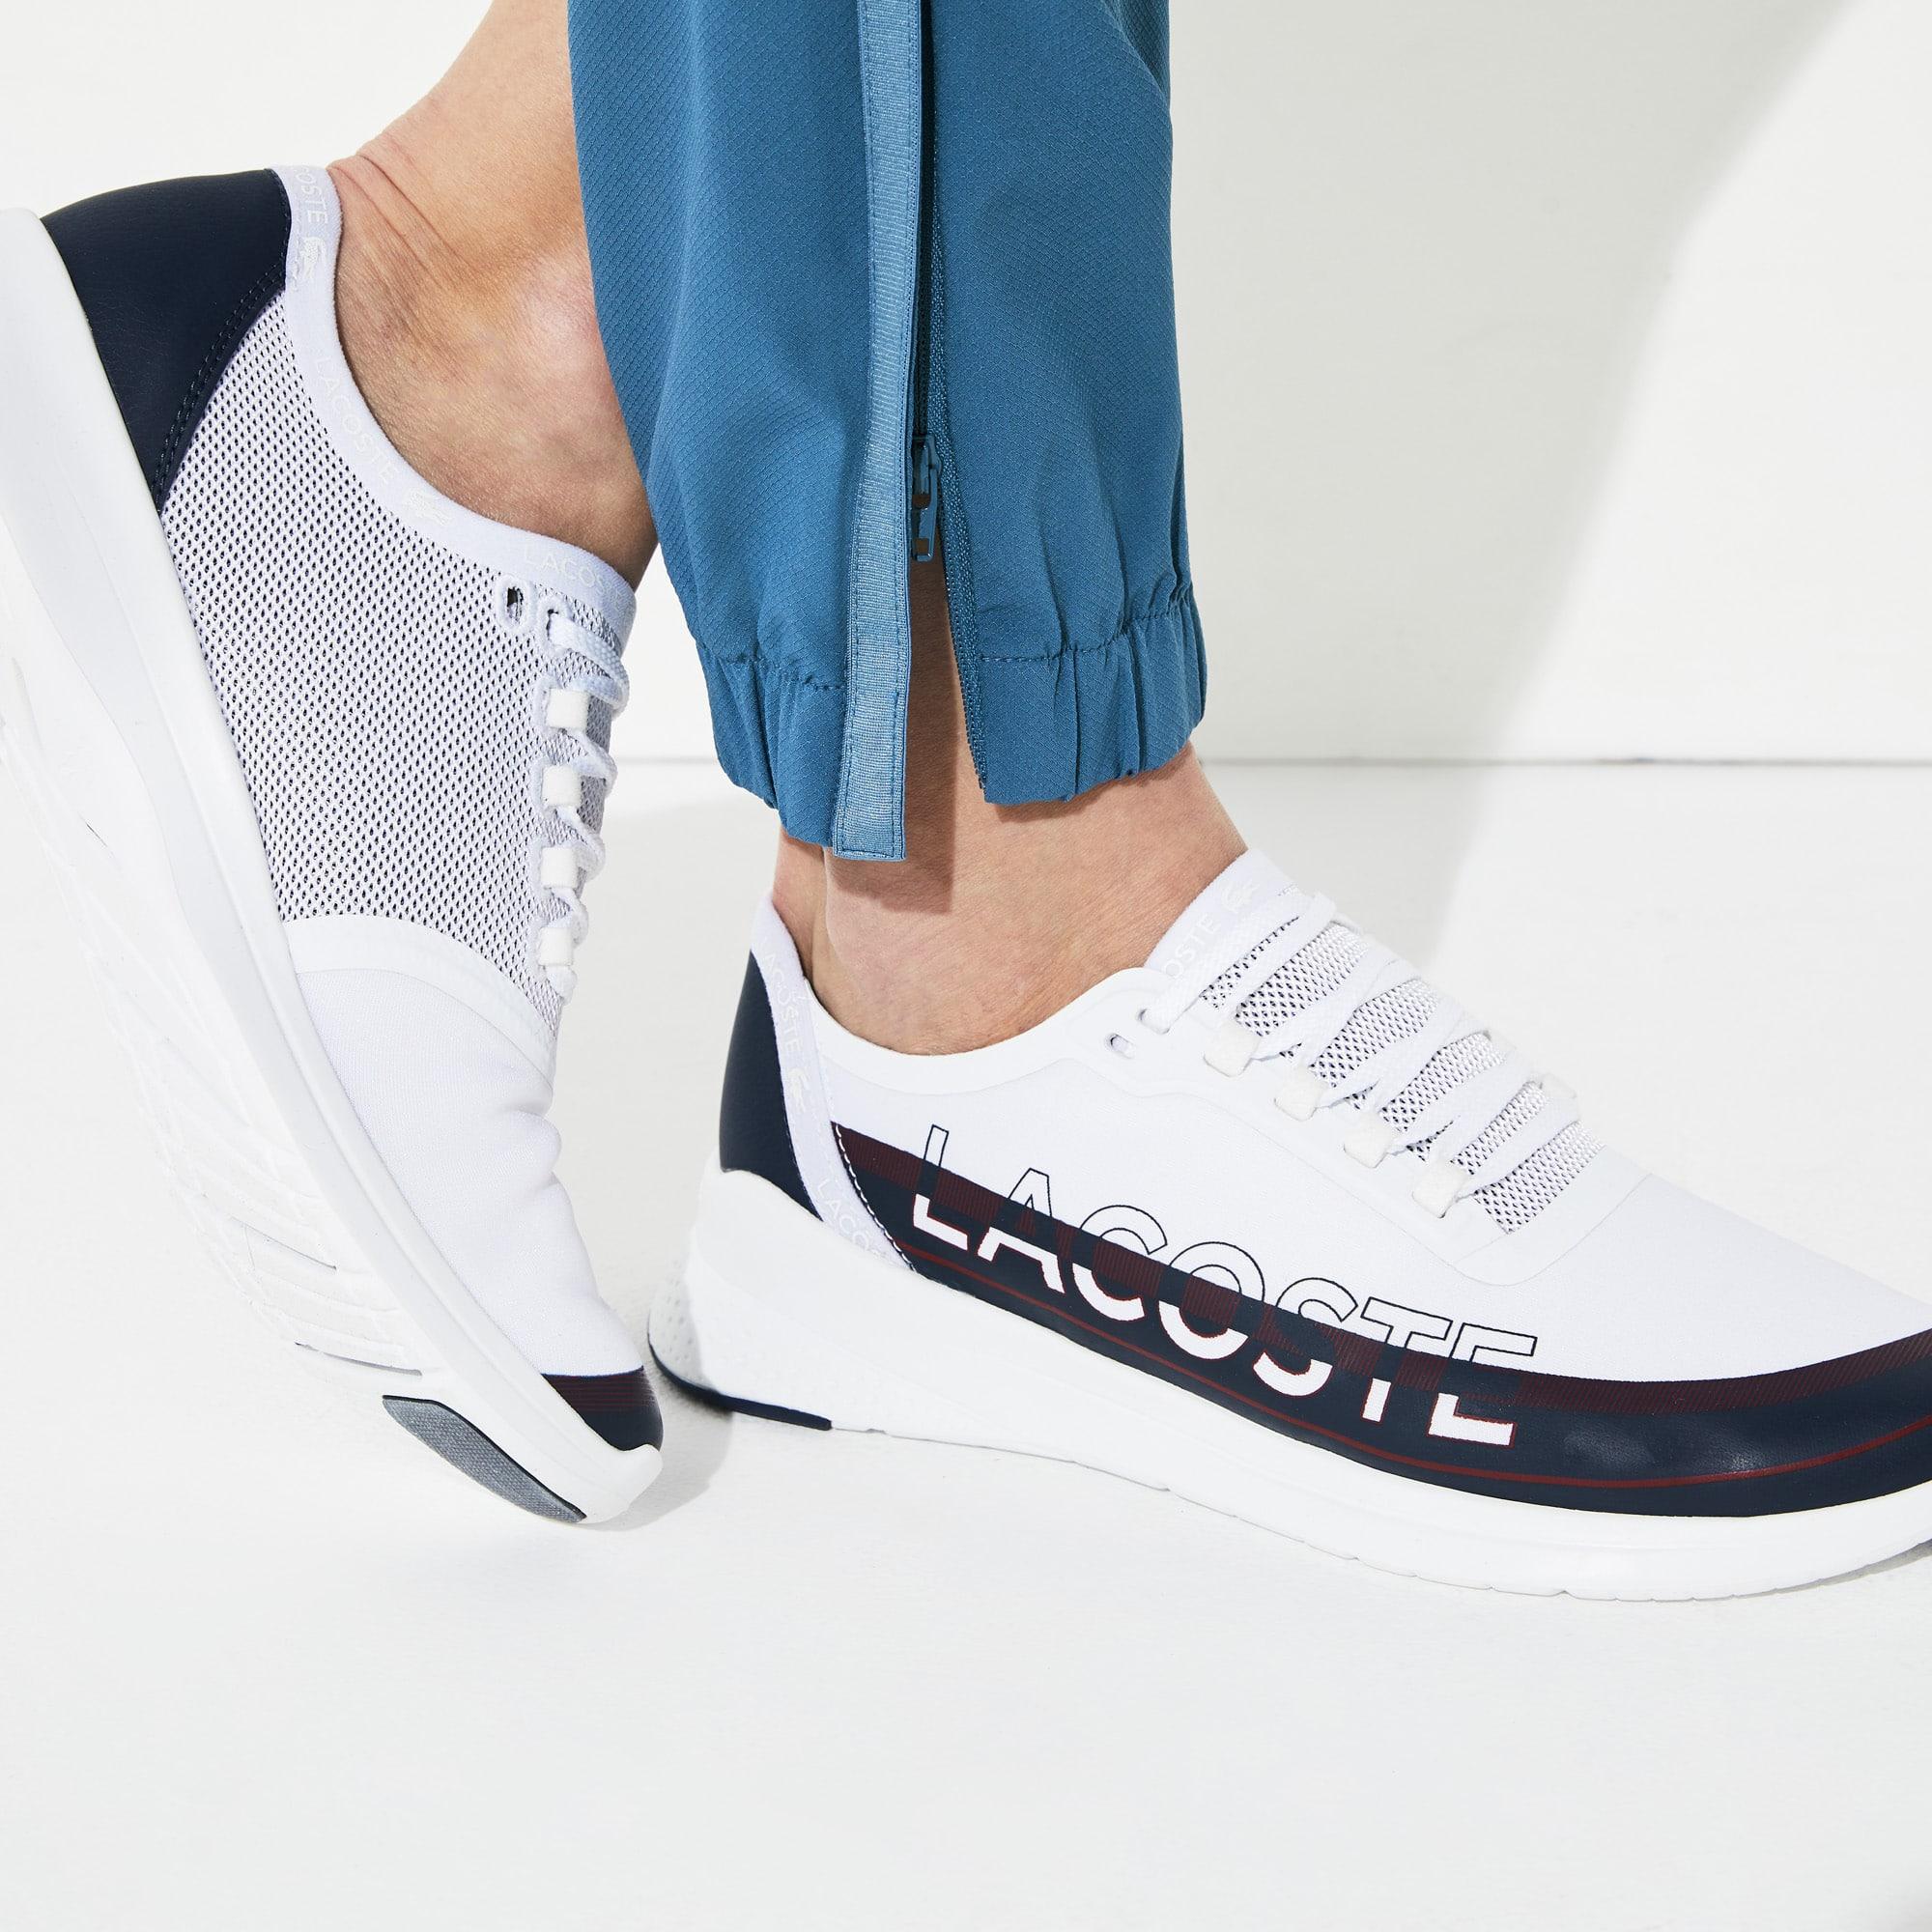 da31b8970fa6b Pantalones deportivos para tenis Lacoste Sport ultra-dry para mujer ...